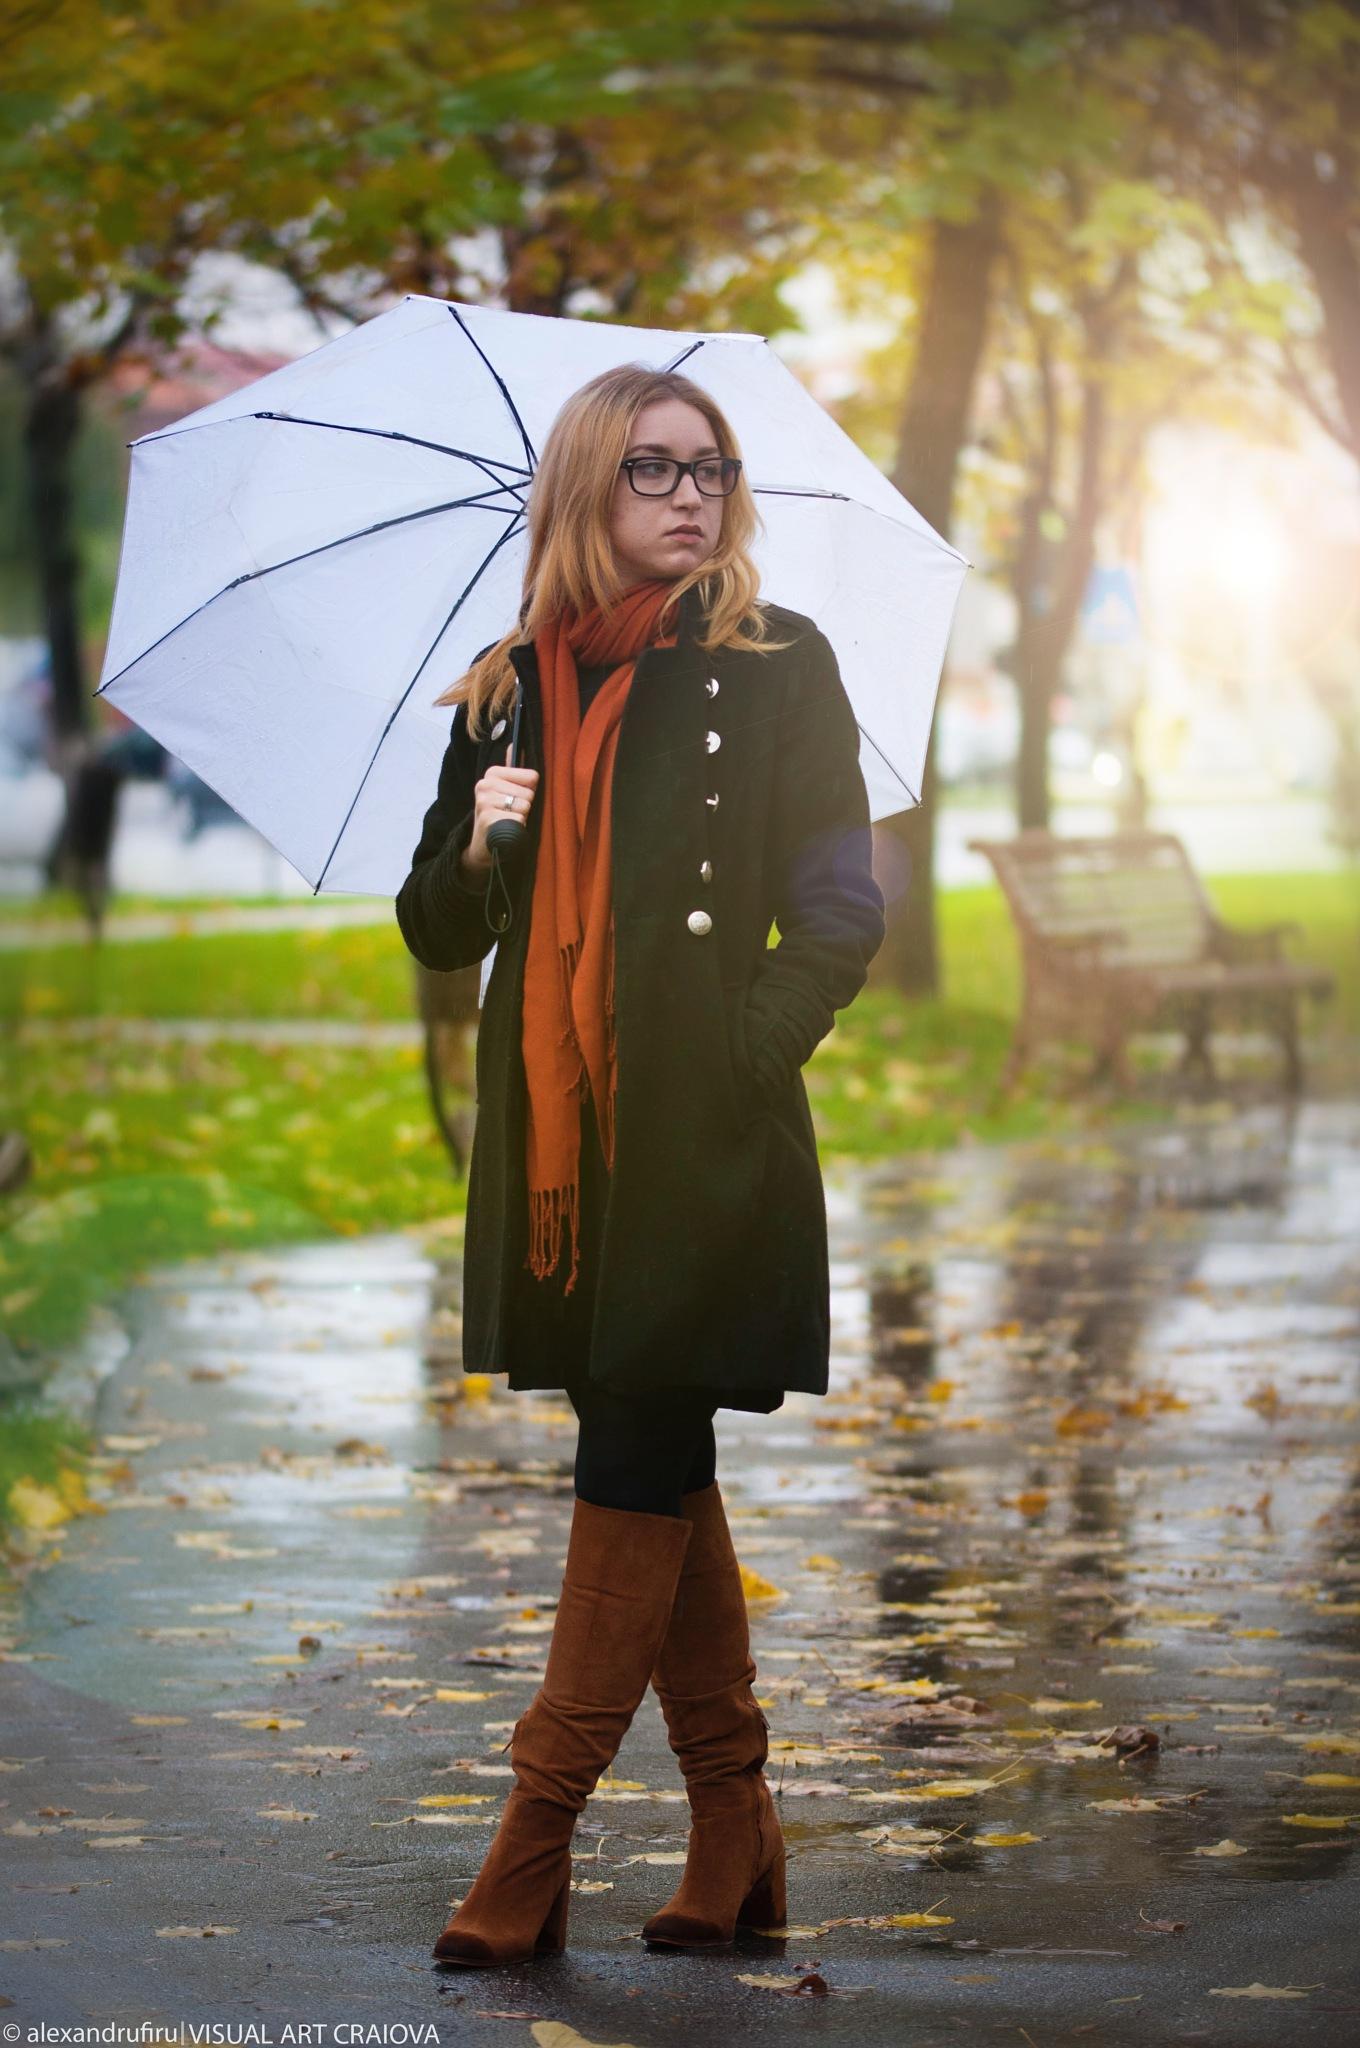 Singing in the rain by Alexandru Firu